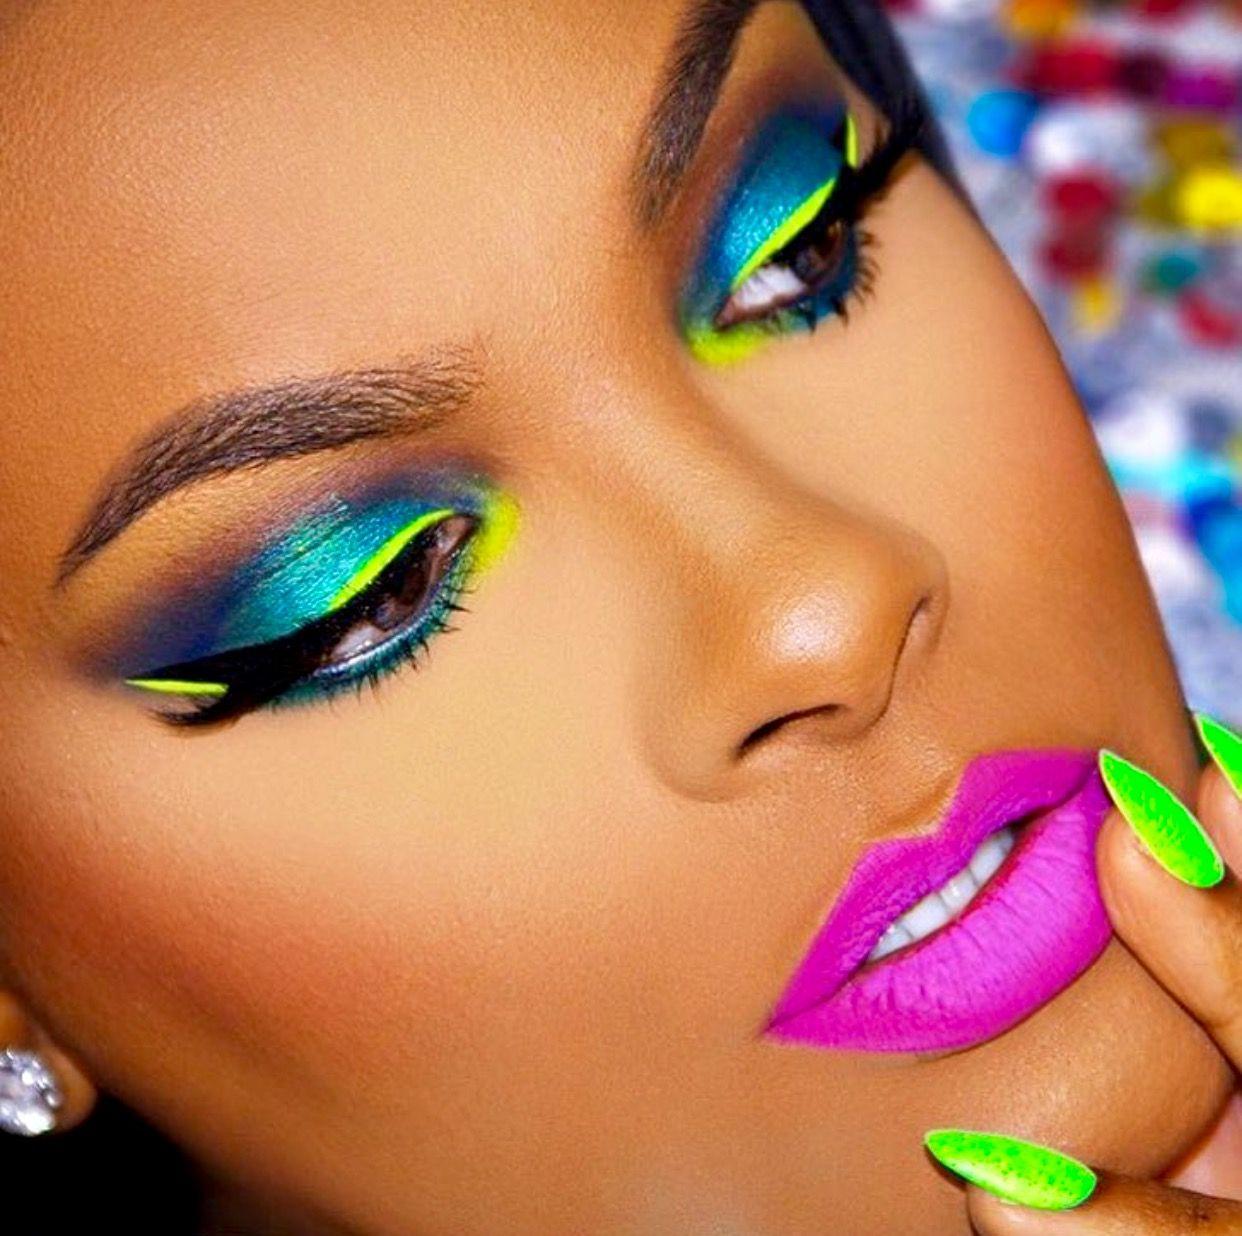 Neon makeup and Nails